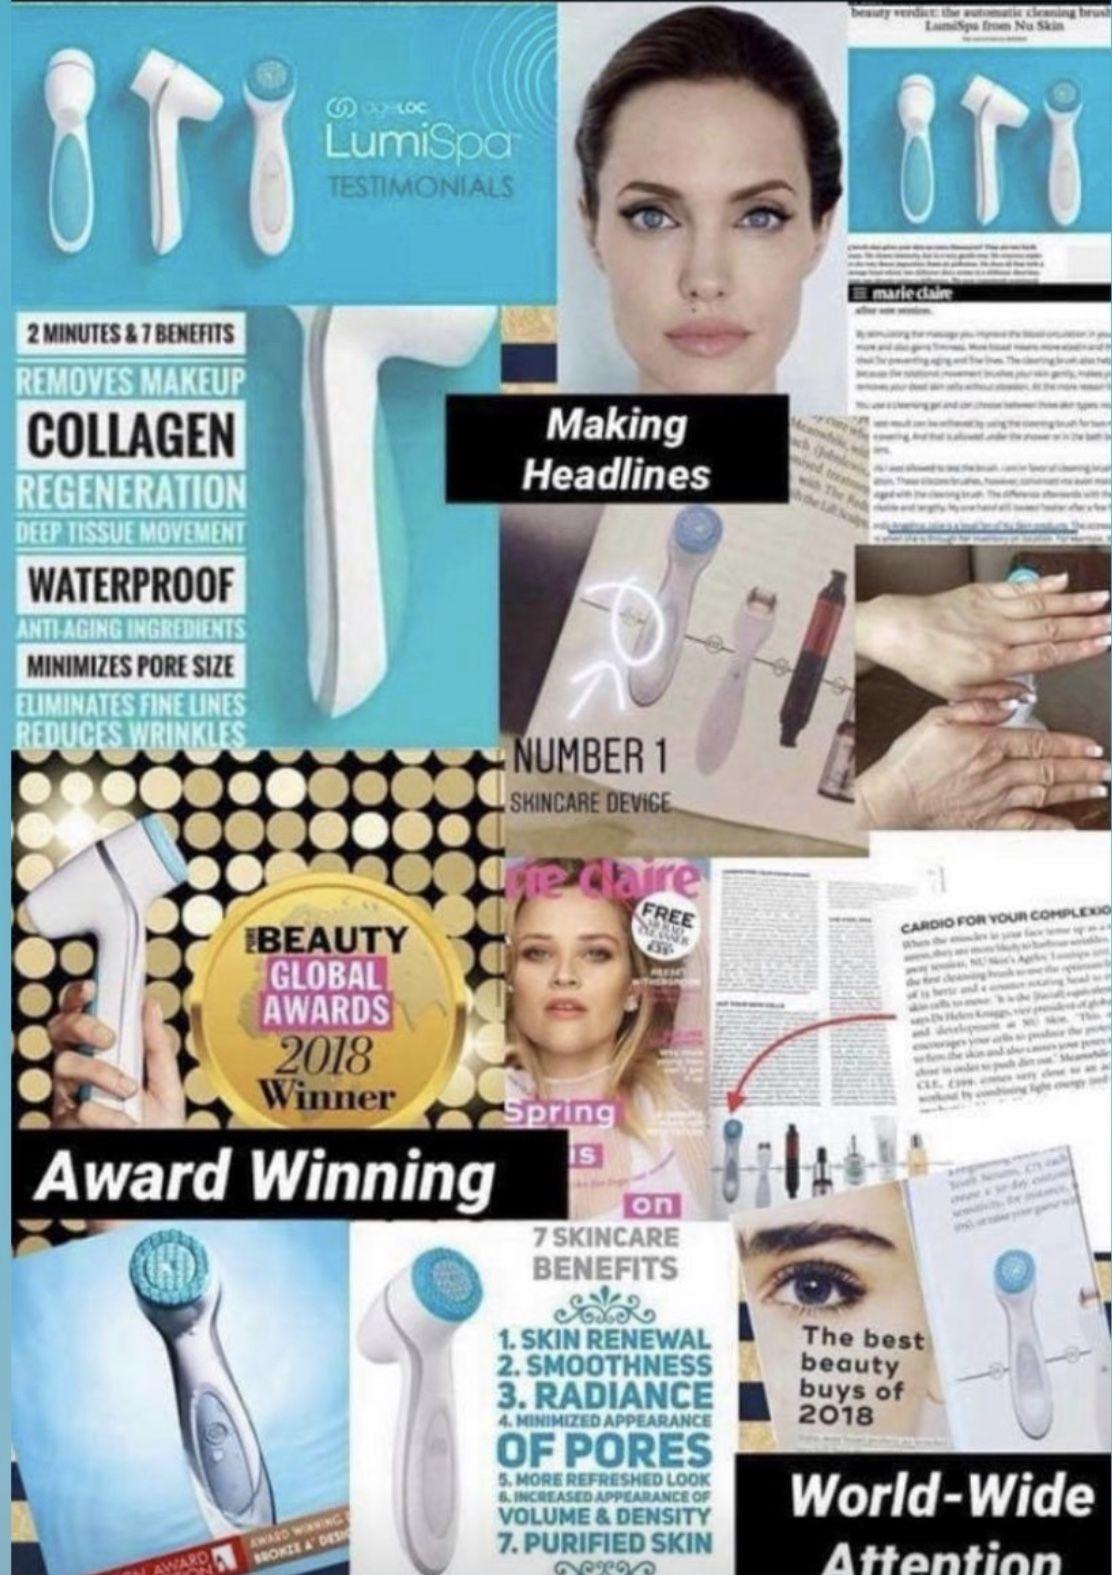 Lumispa Skin Care Devices Skin Care Benefits Face Products Skincare